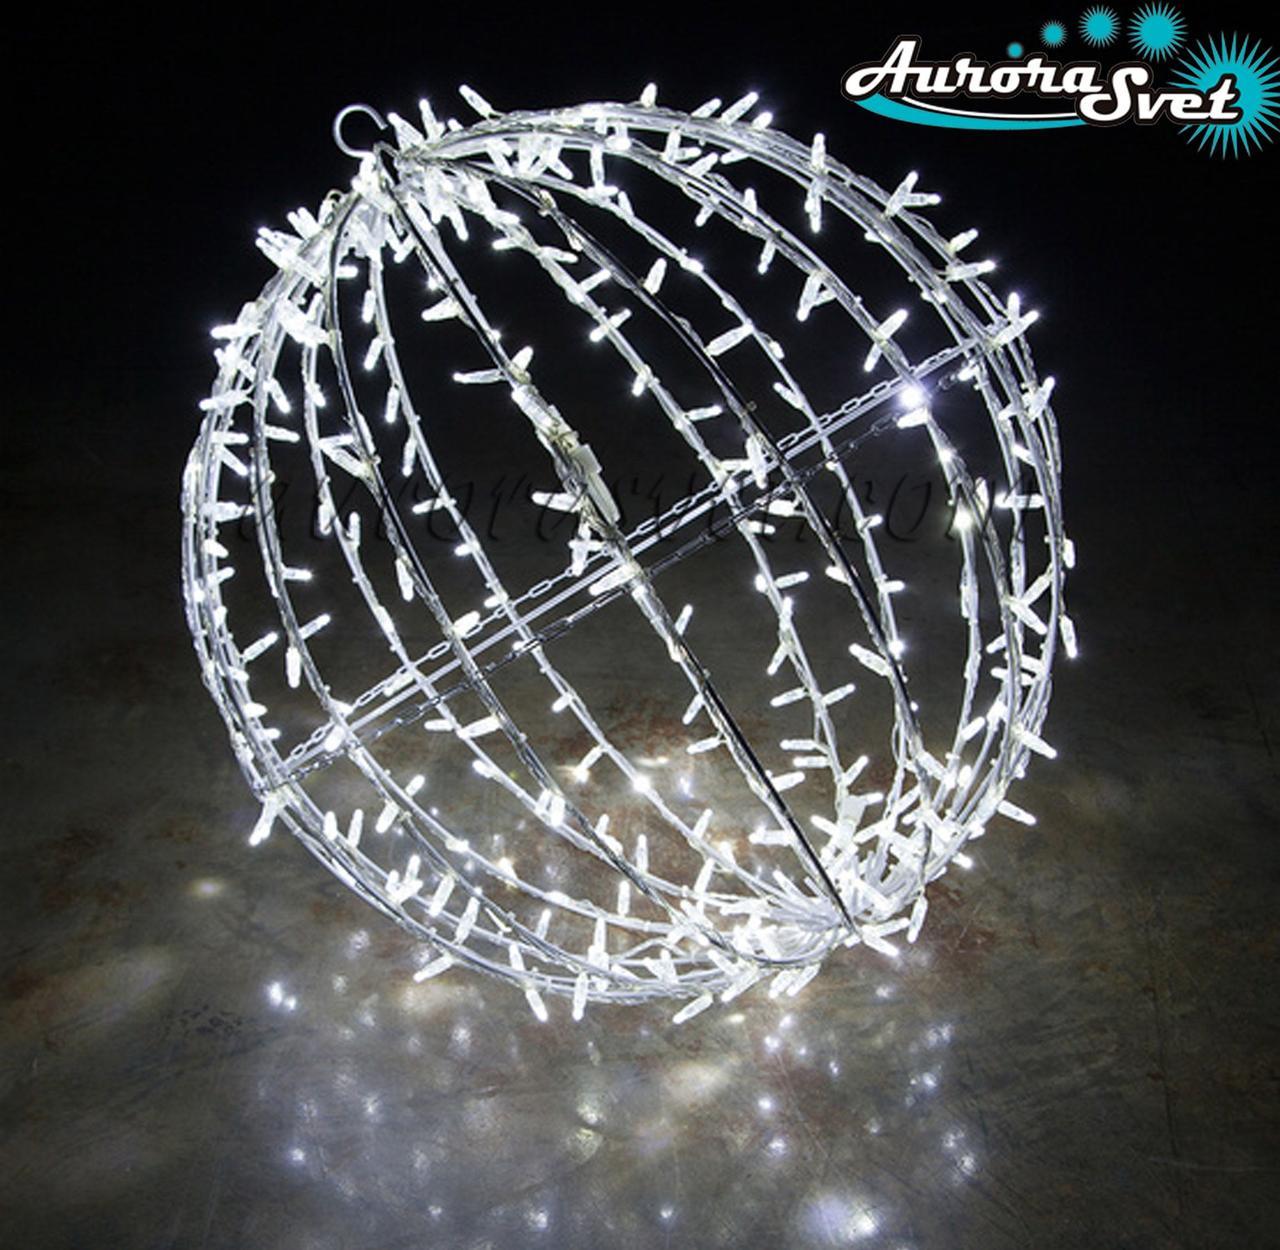 Светодиодная LED фигура шар из гирлянды AuroraSvet 40cм 100 led